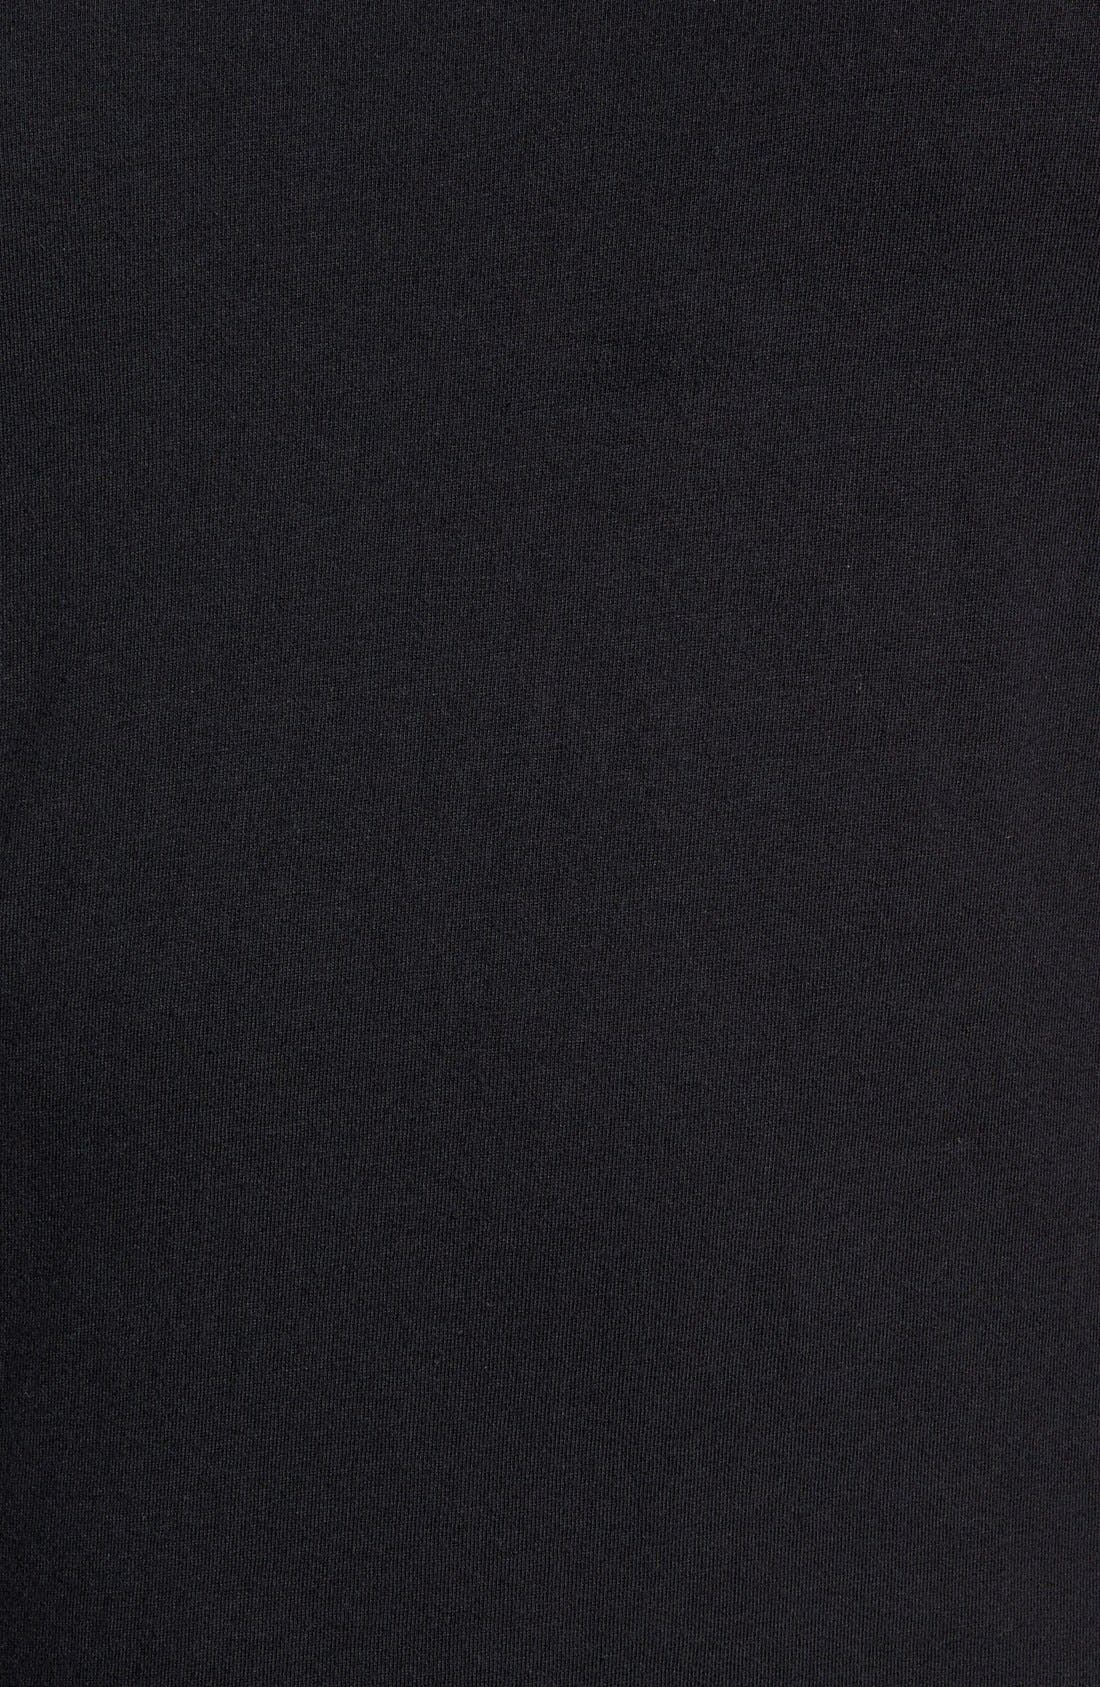 'Flintlock' Longline Crewneck T-Shirt,                             Alternate thumbnail 5, color,                             Black